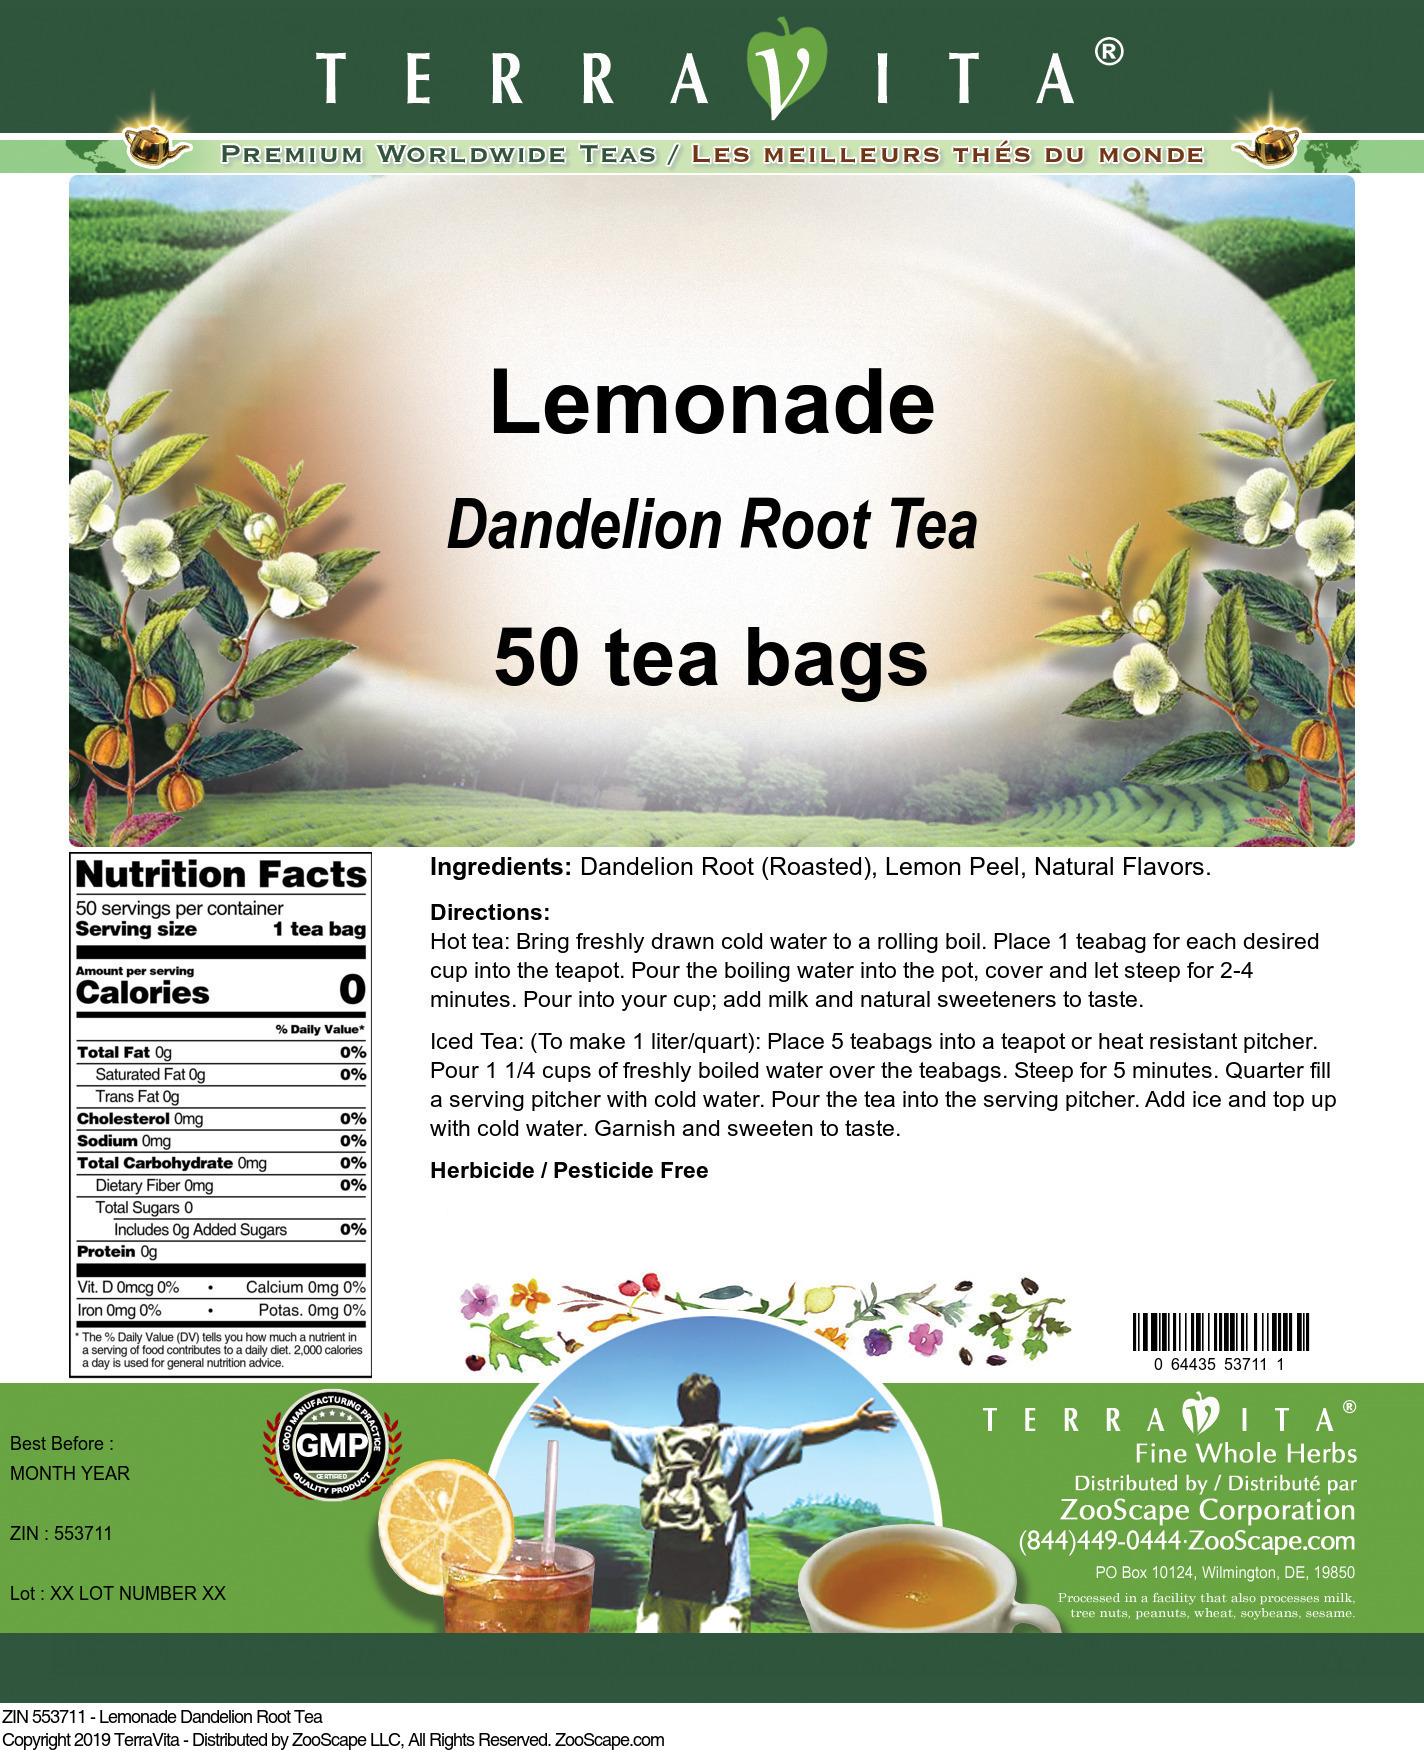 Lemonade Dandelion Root